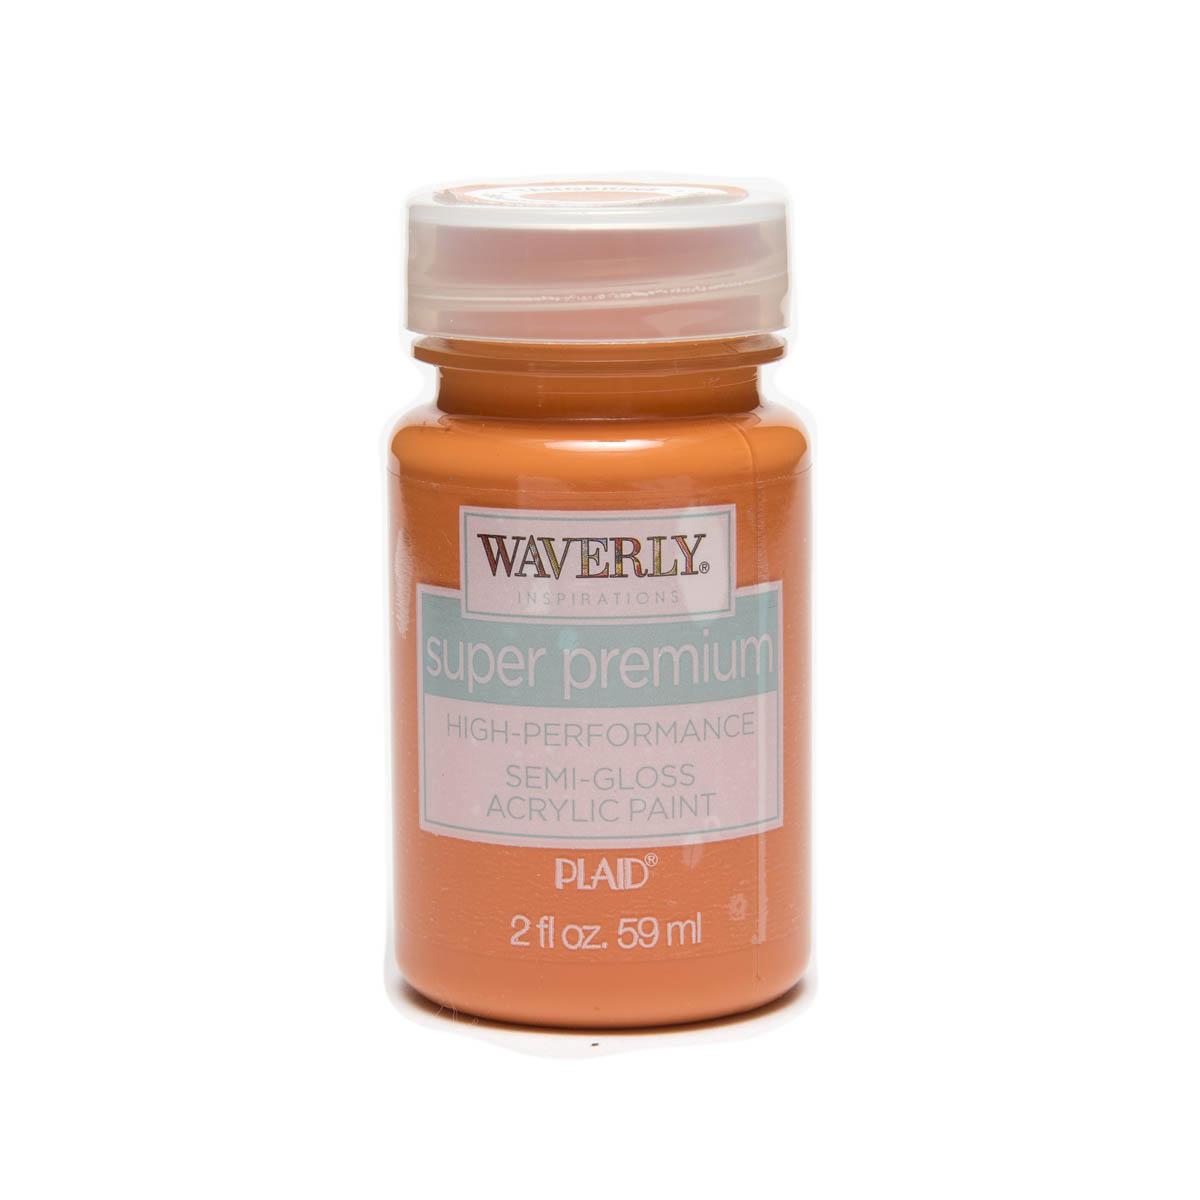 Waverly ® Inspirations Super Premium Semi-Gloss Acrylic Paint - Tangerine, 2 oz.